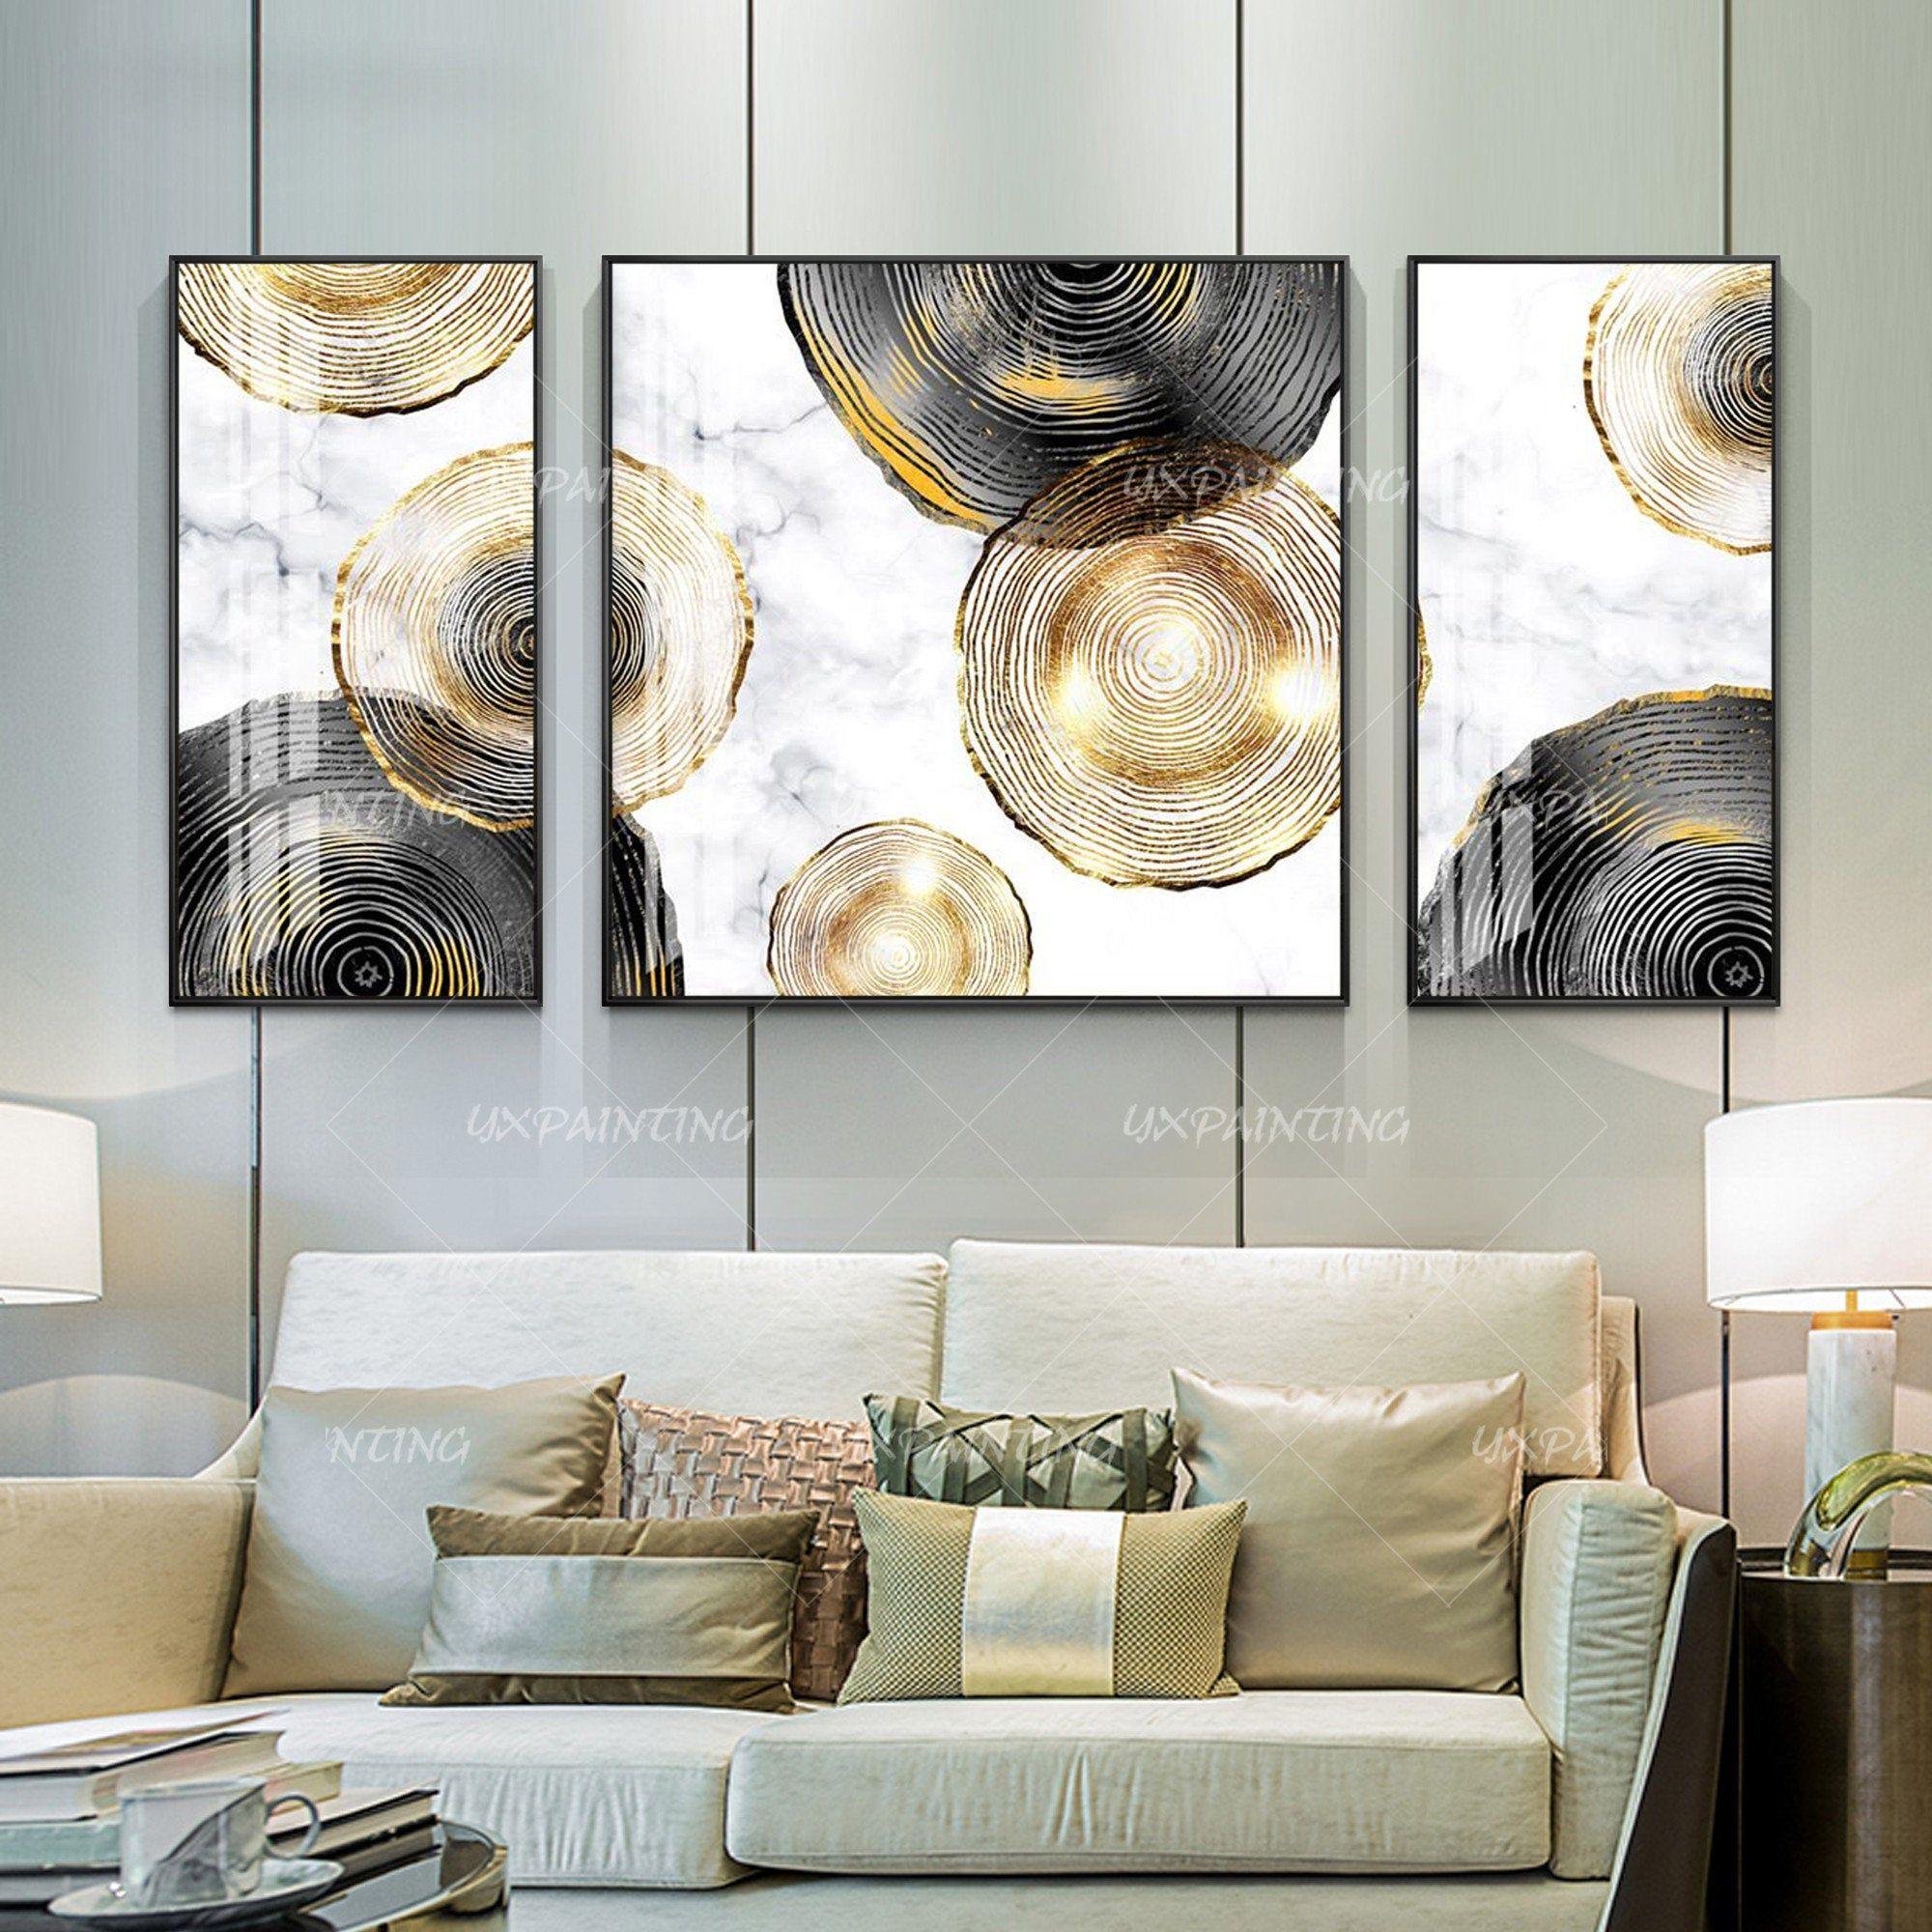 Gold Art Set Of 3 Wall Art Acrylic Paintings On Canvas Etsy Frames On Wall Home Decor Wall Art Framed Wall Art Modern art frames for living room